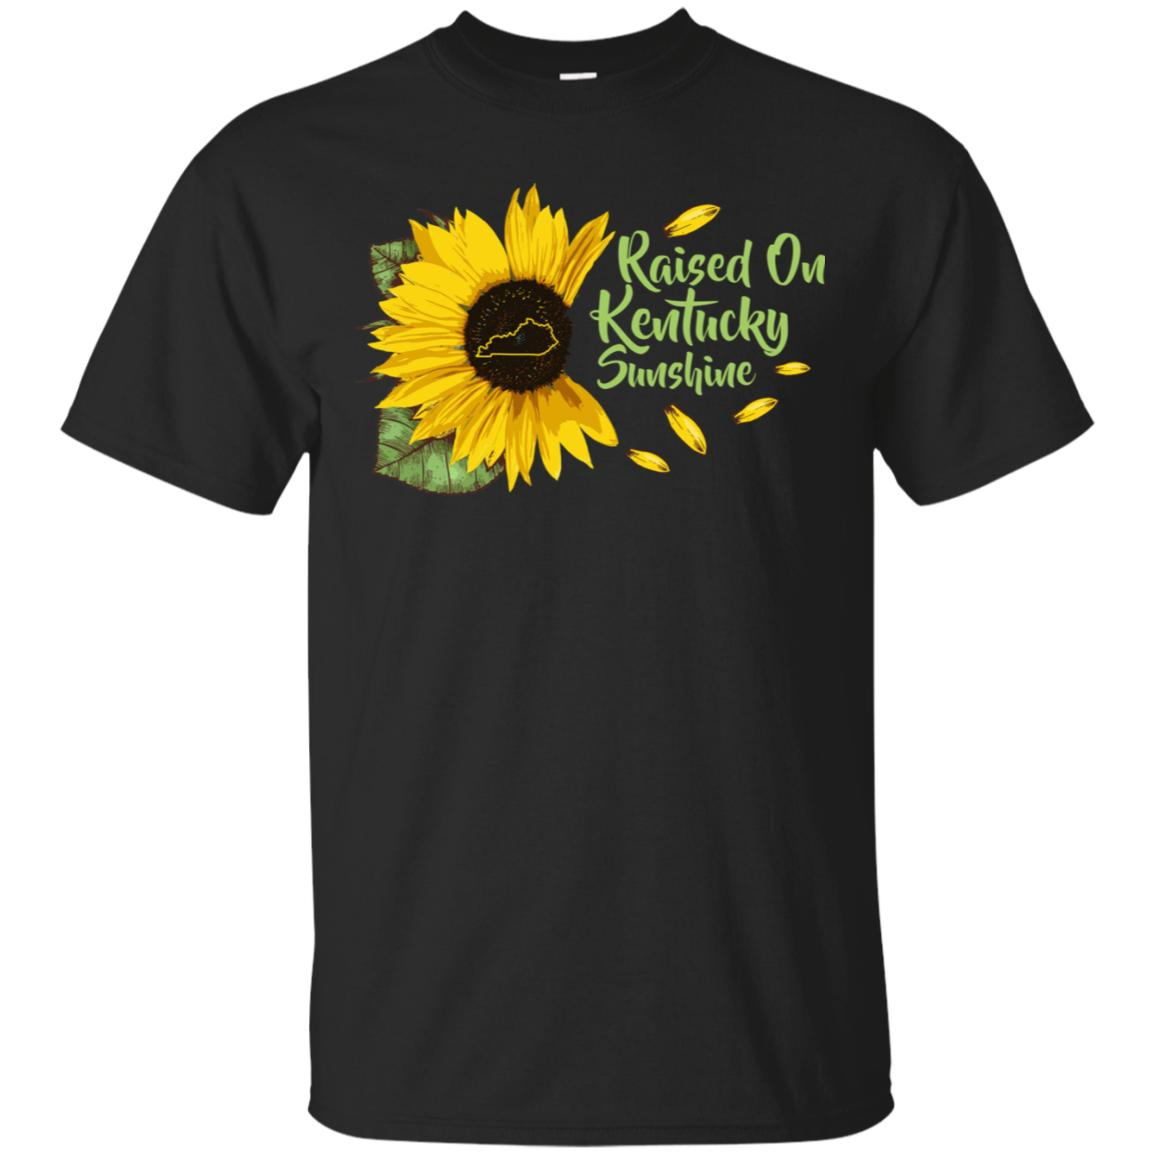 Raised On Kentucky Sunshine Sunflower Vintage T-Shirt